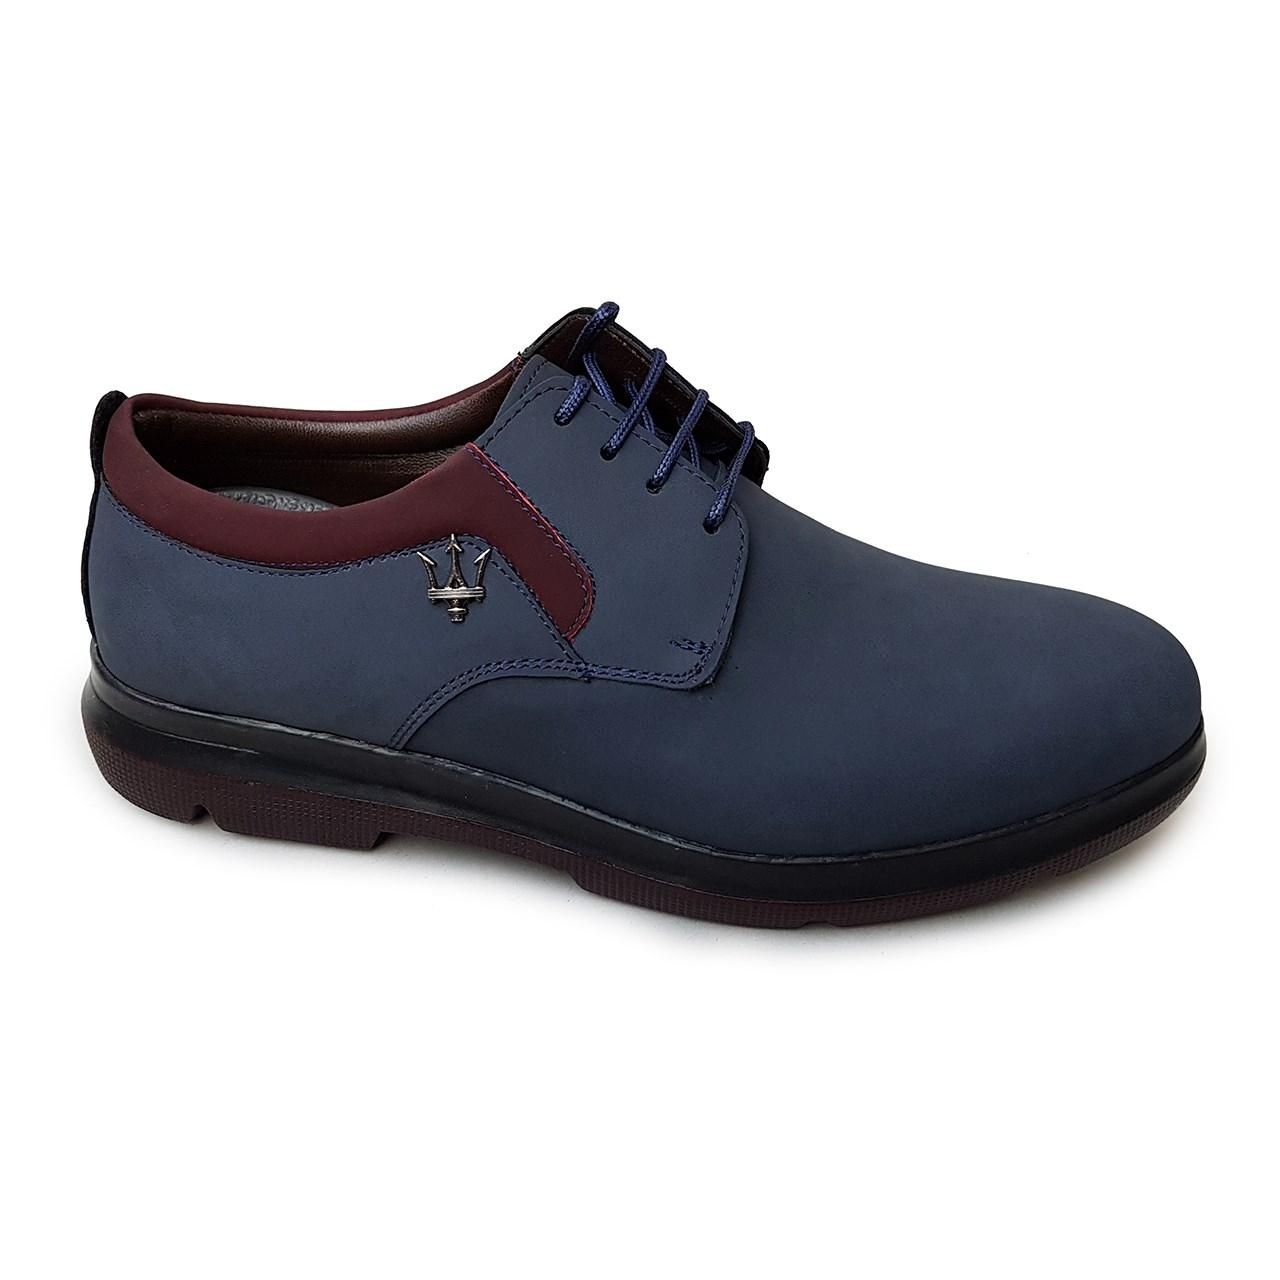 قیمت کفش مردانه چرم طبیعی دیاکو مدلMSL-BARSELON-SORMEI